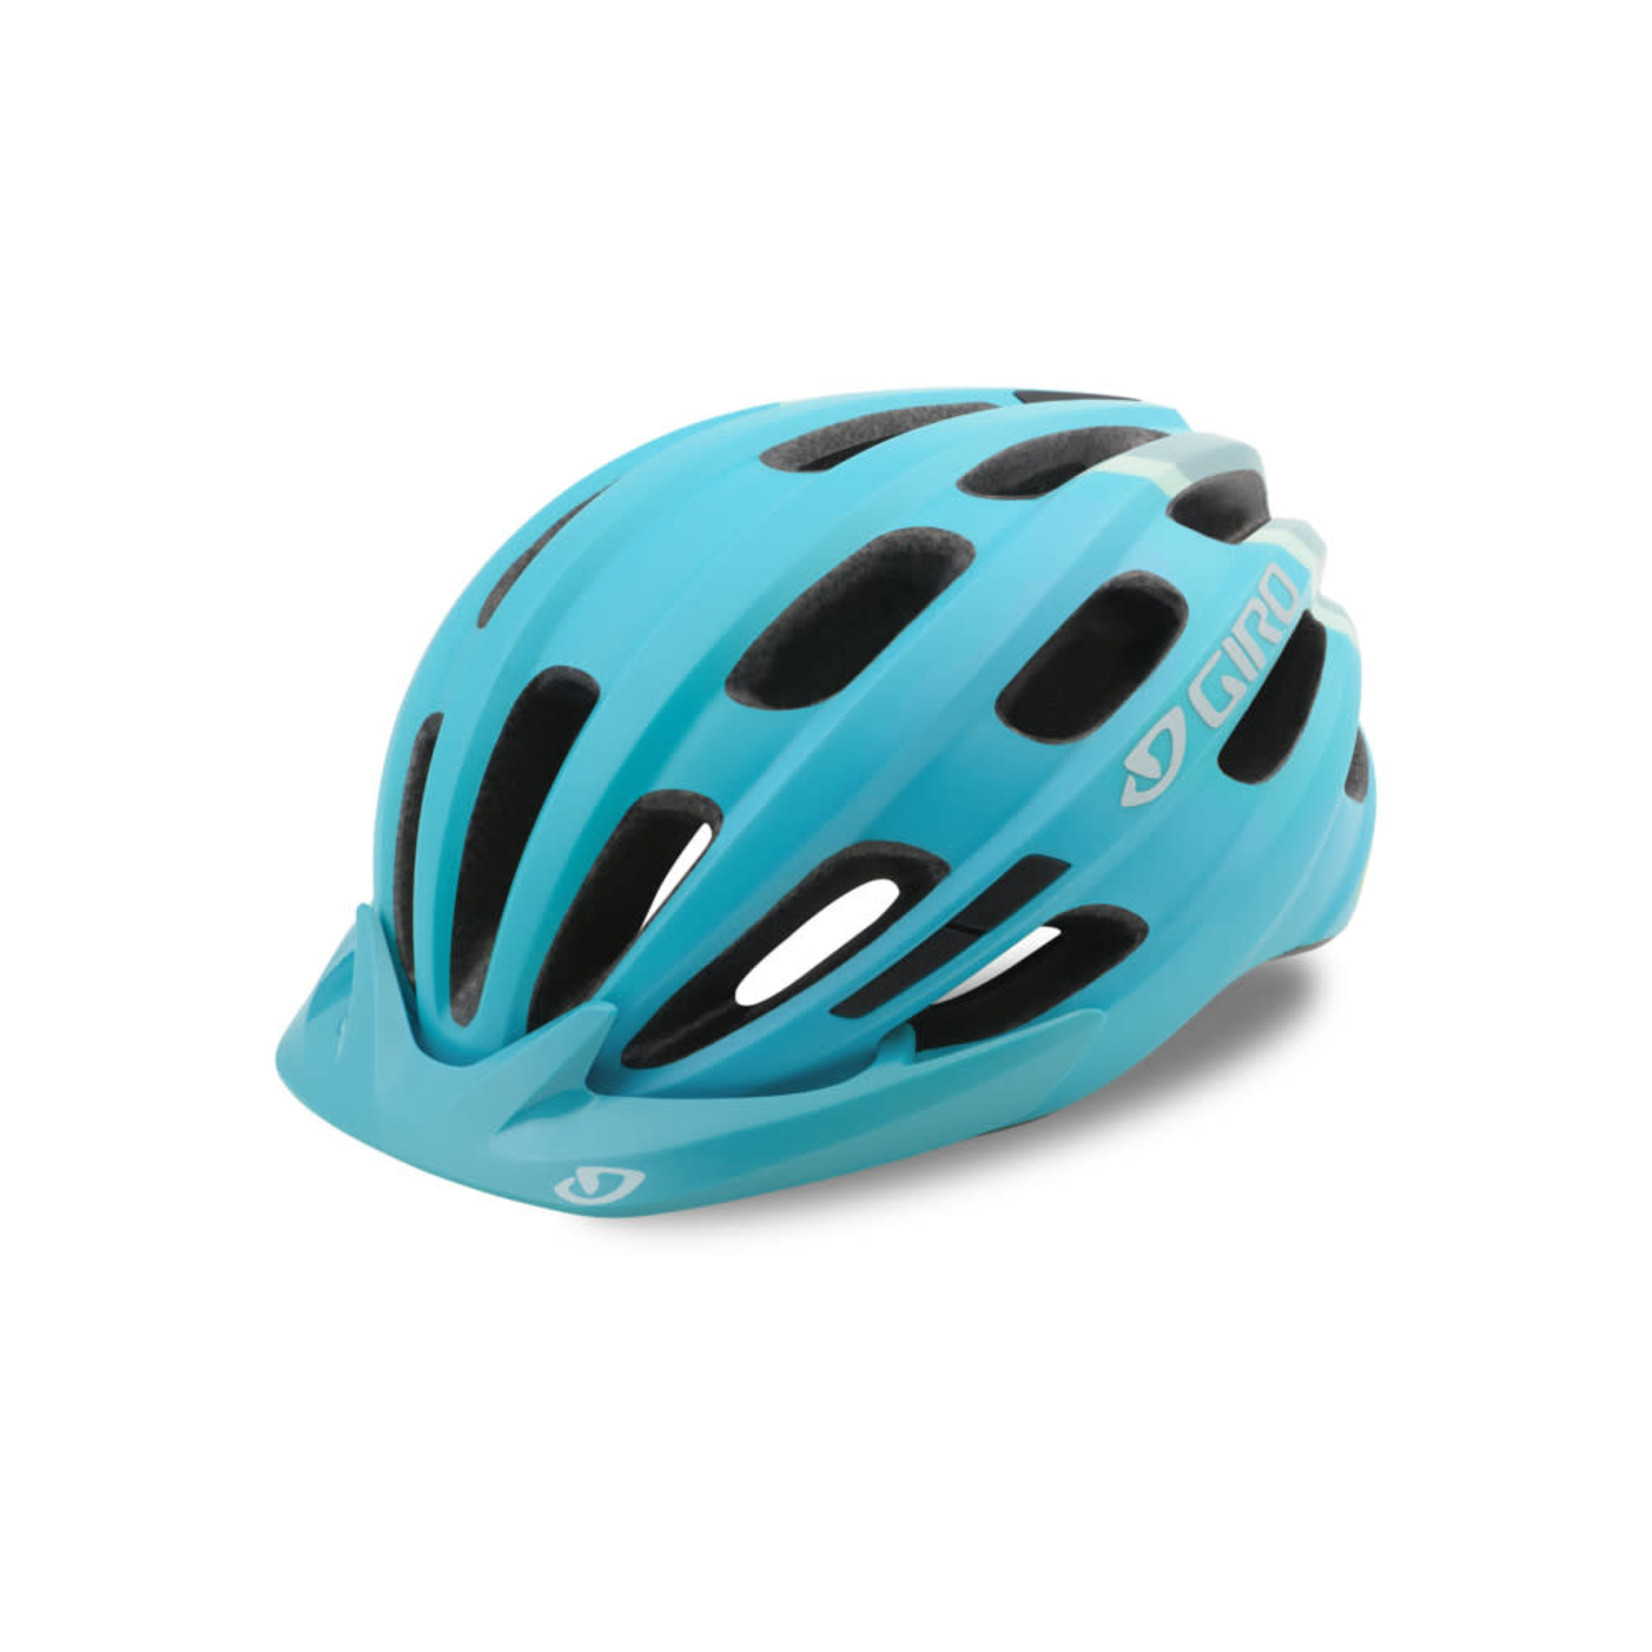 Giro Giro Hale MIPS Helmet